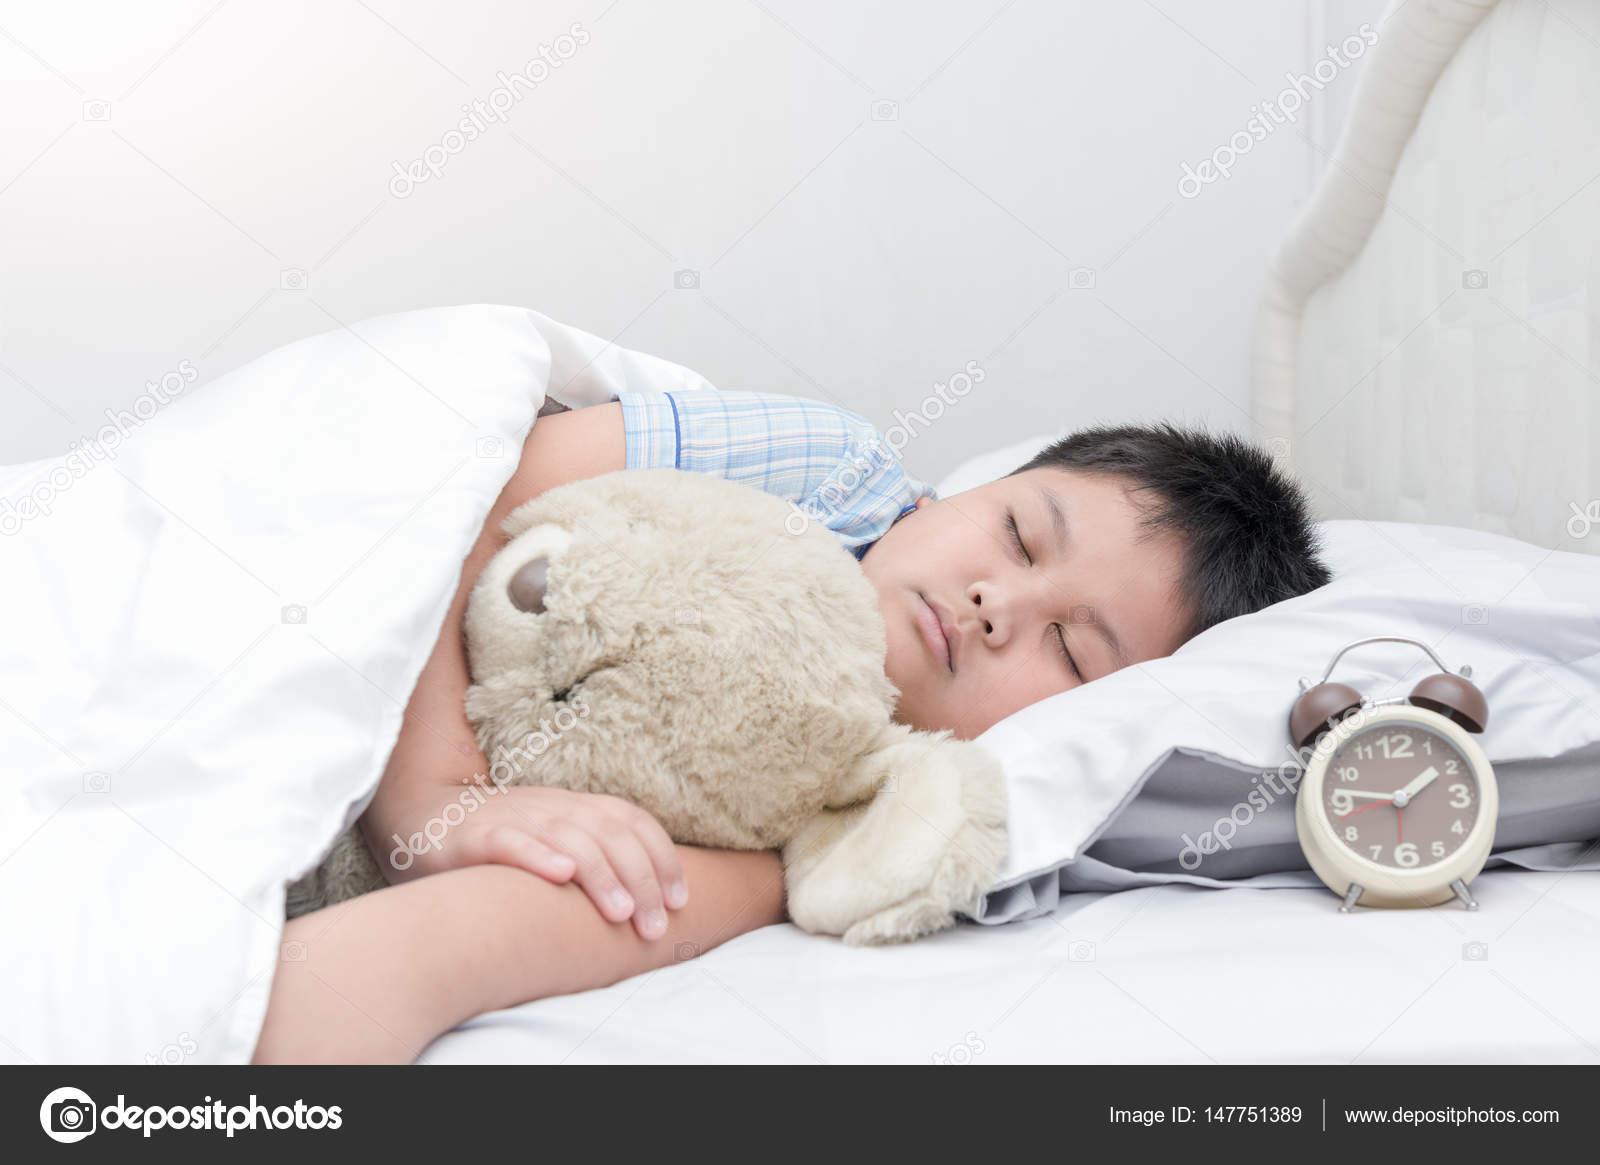 Obese fat boy sleep and hug teddy bear on bed stock photo